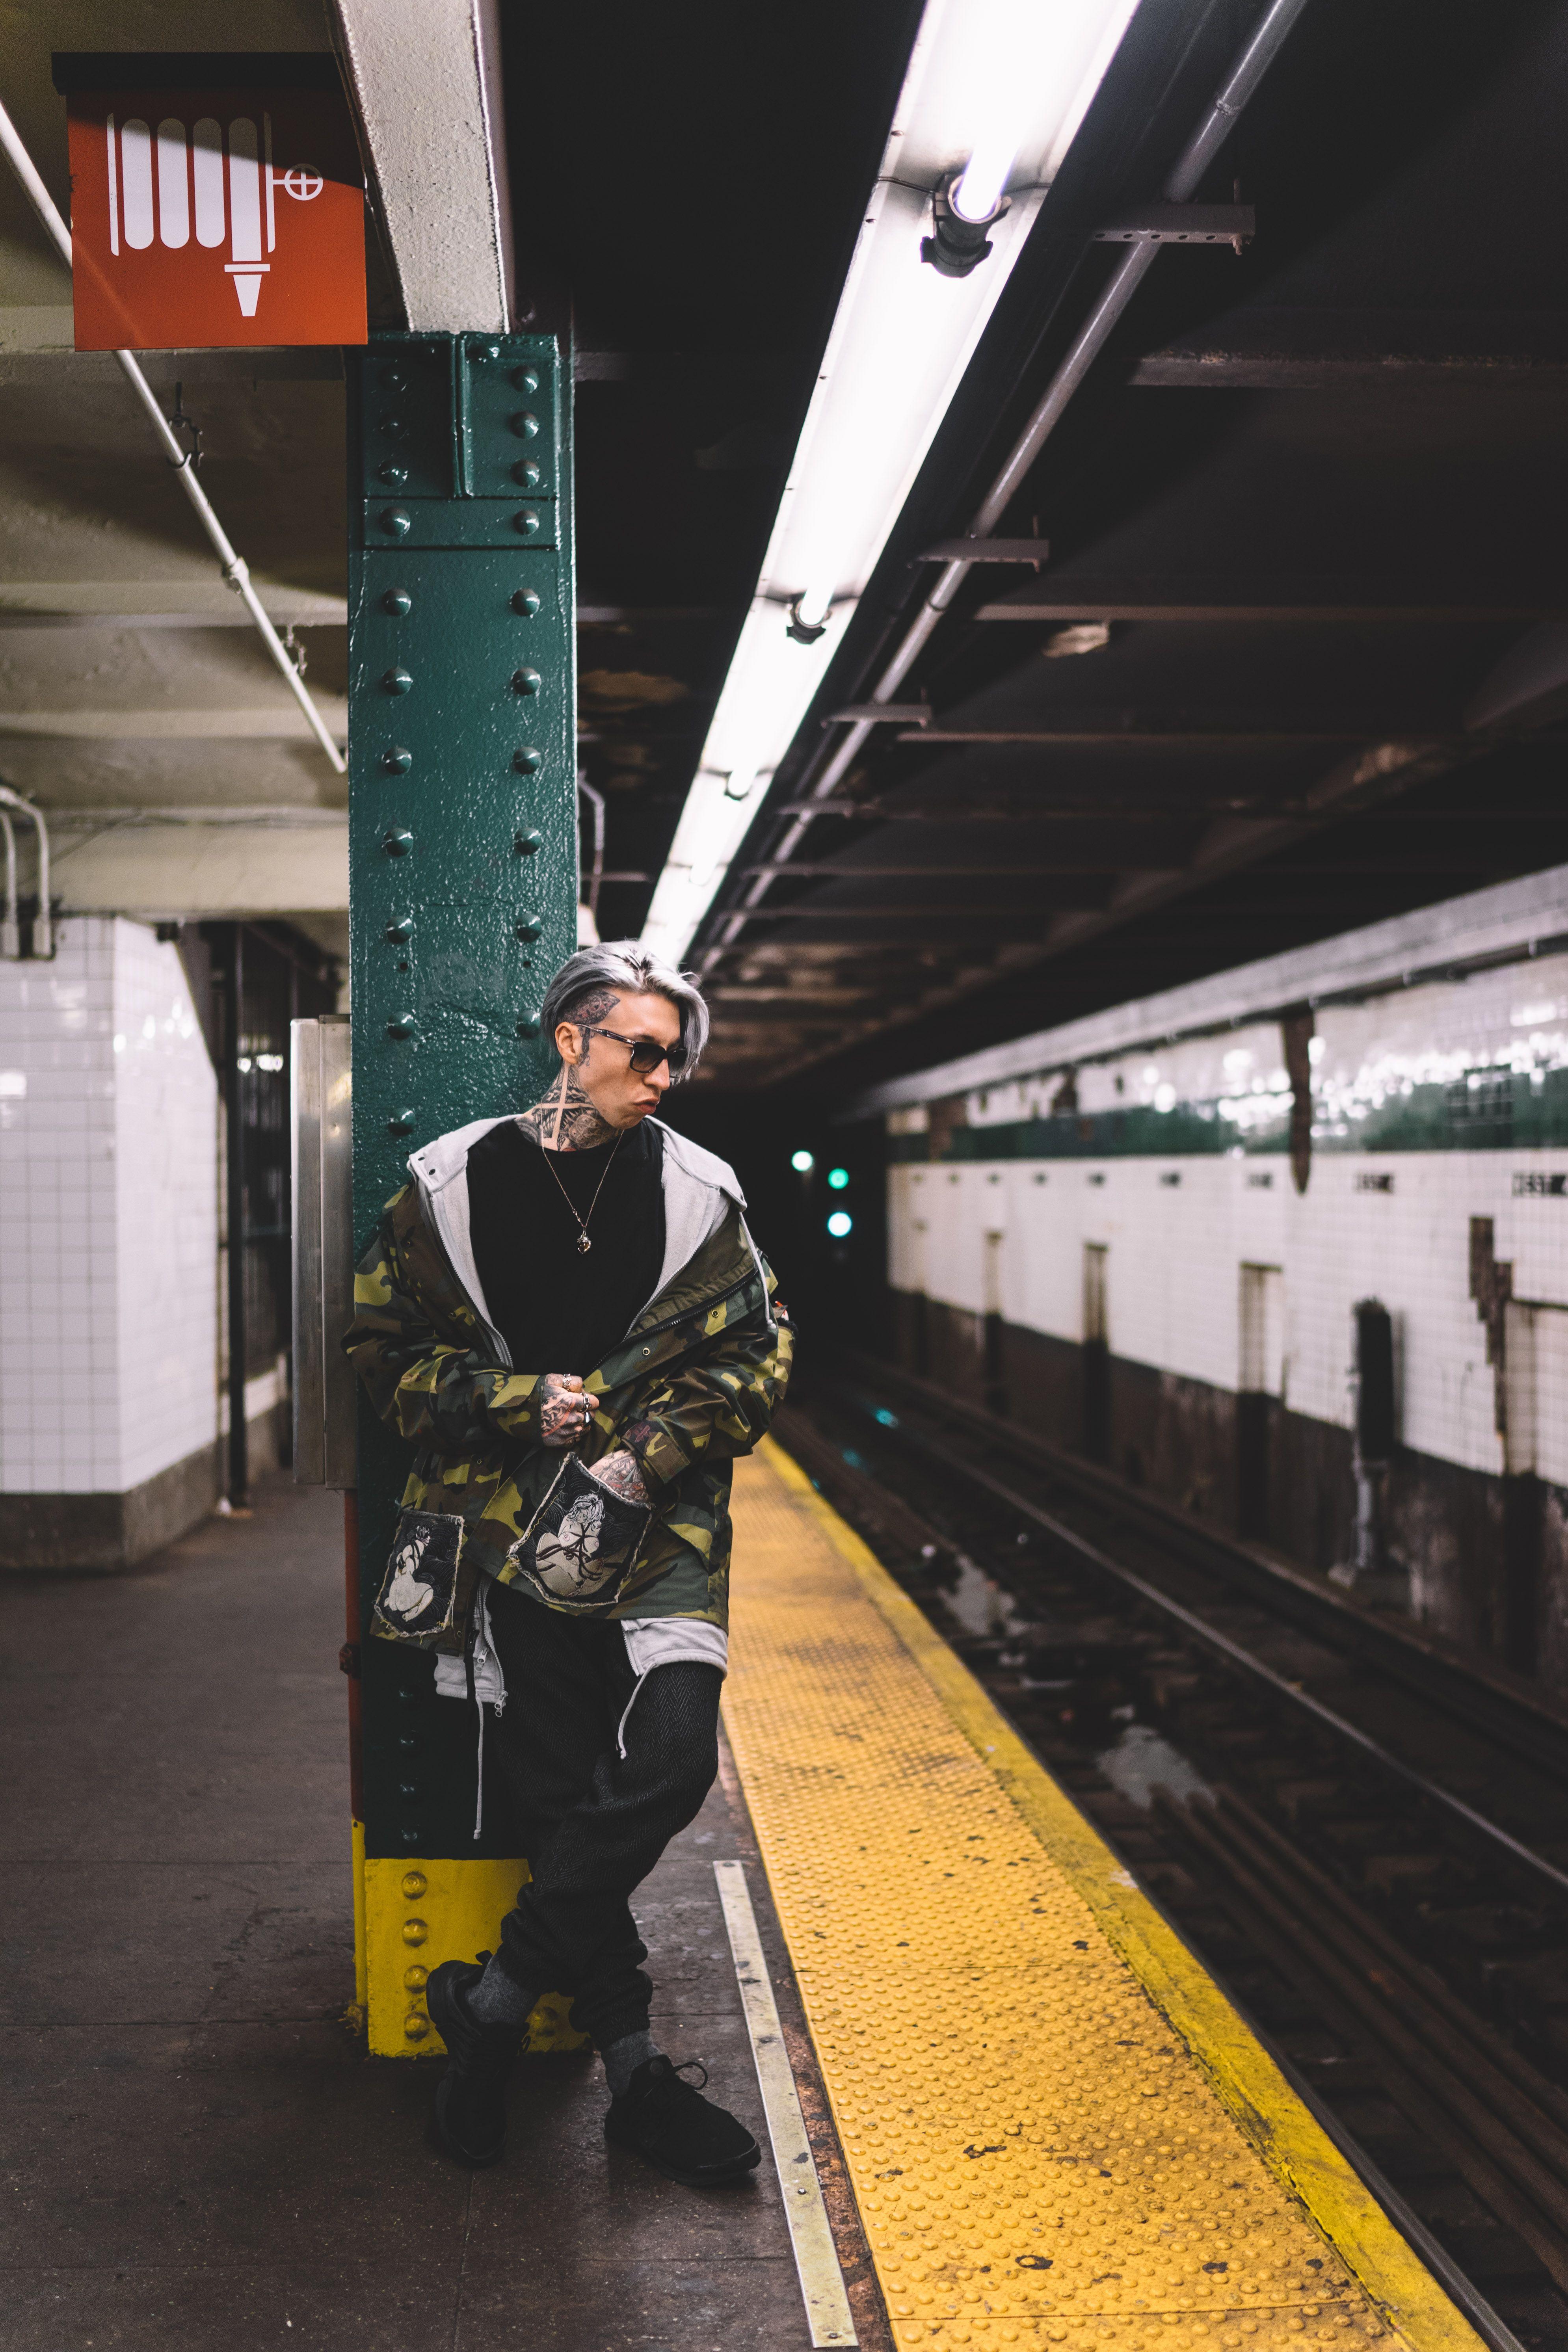 #chrislavish #supermodel #inked #inkedmodel #photoshoot #art #style #tattoo #inkmodel #model #tattoomodel #snowstorm #newyork #portrait #fashion #tattoosupermodel #nyclavish #lamodel #subway #stylist #inspiration #art #tats #mta  #fashionblogger #nyc #fashionicon #underground #streetwear #monochrome #arts